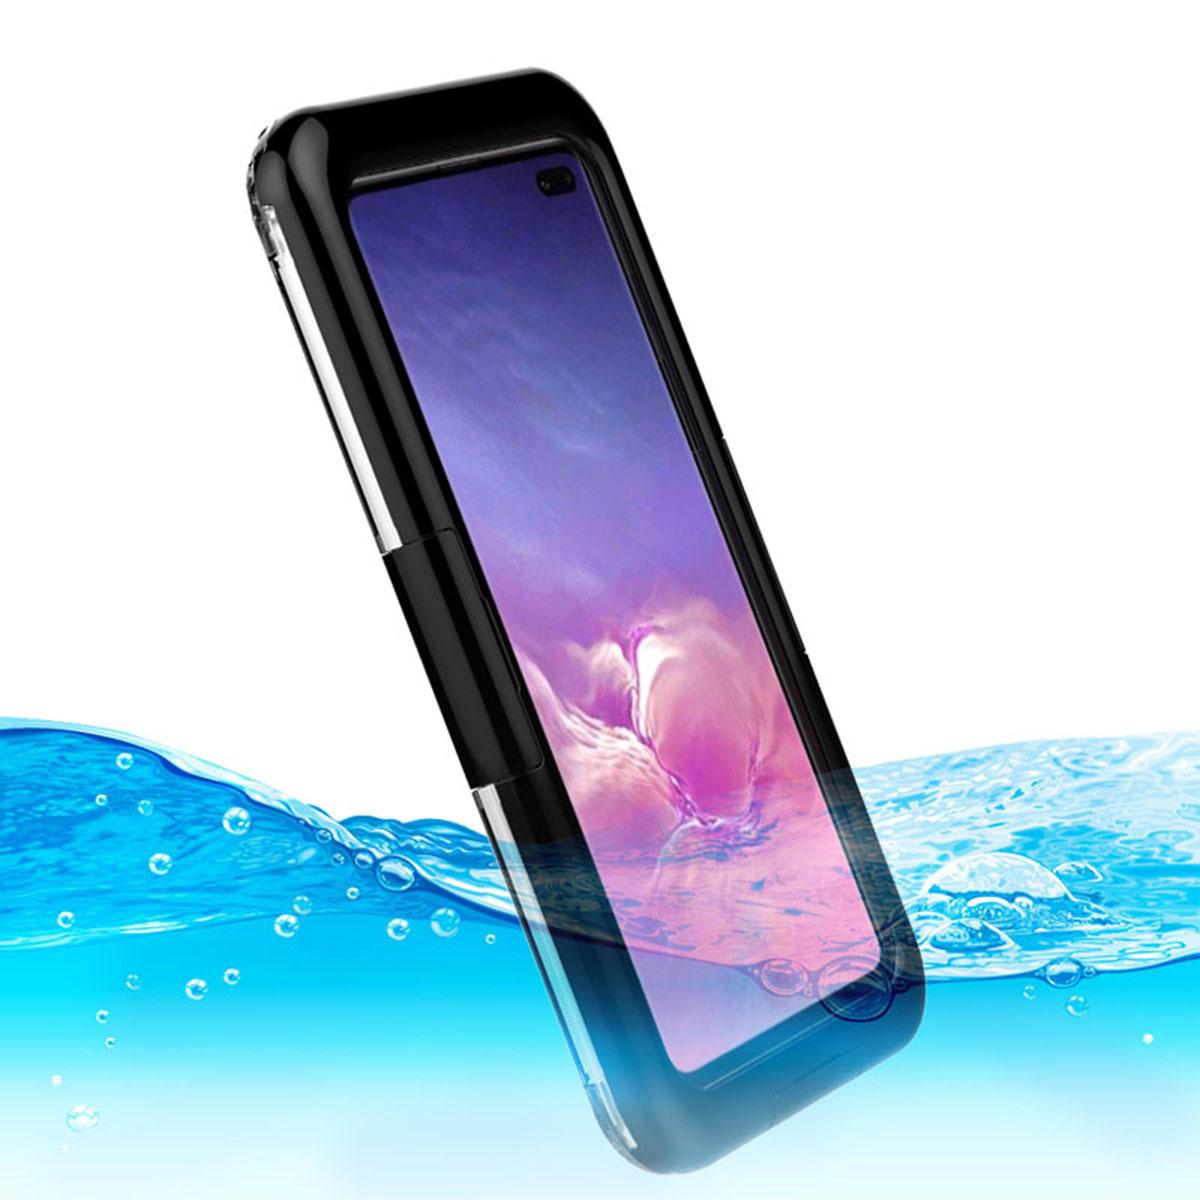 Bakeey IP68 Waterproof Case For Samsung Galaxy S10 Plus 6.4 Inch Dirtproof Snowproof Shockproof Cover